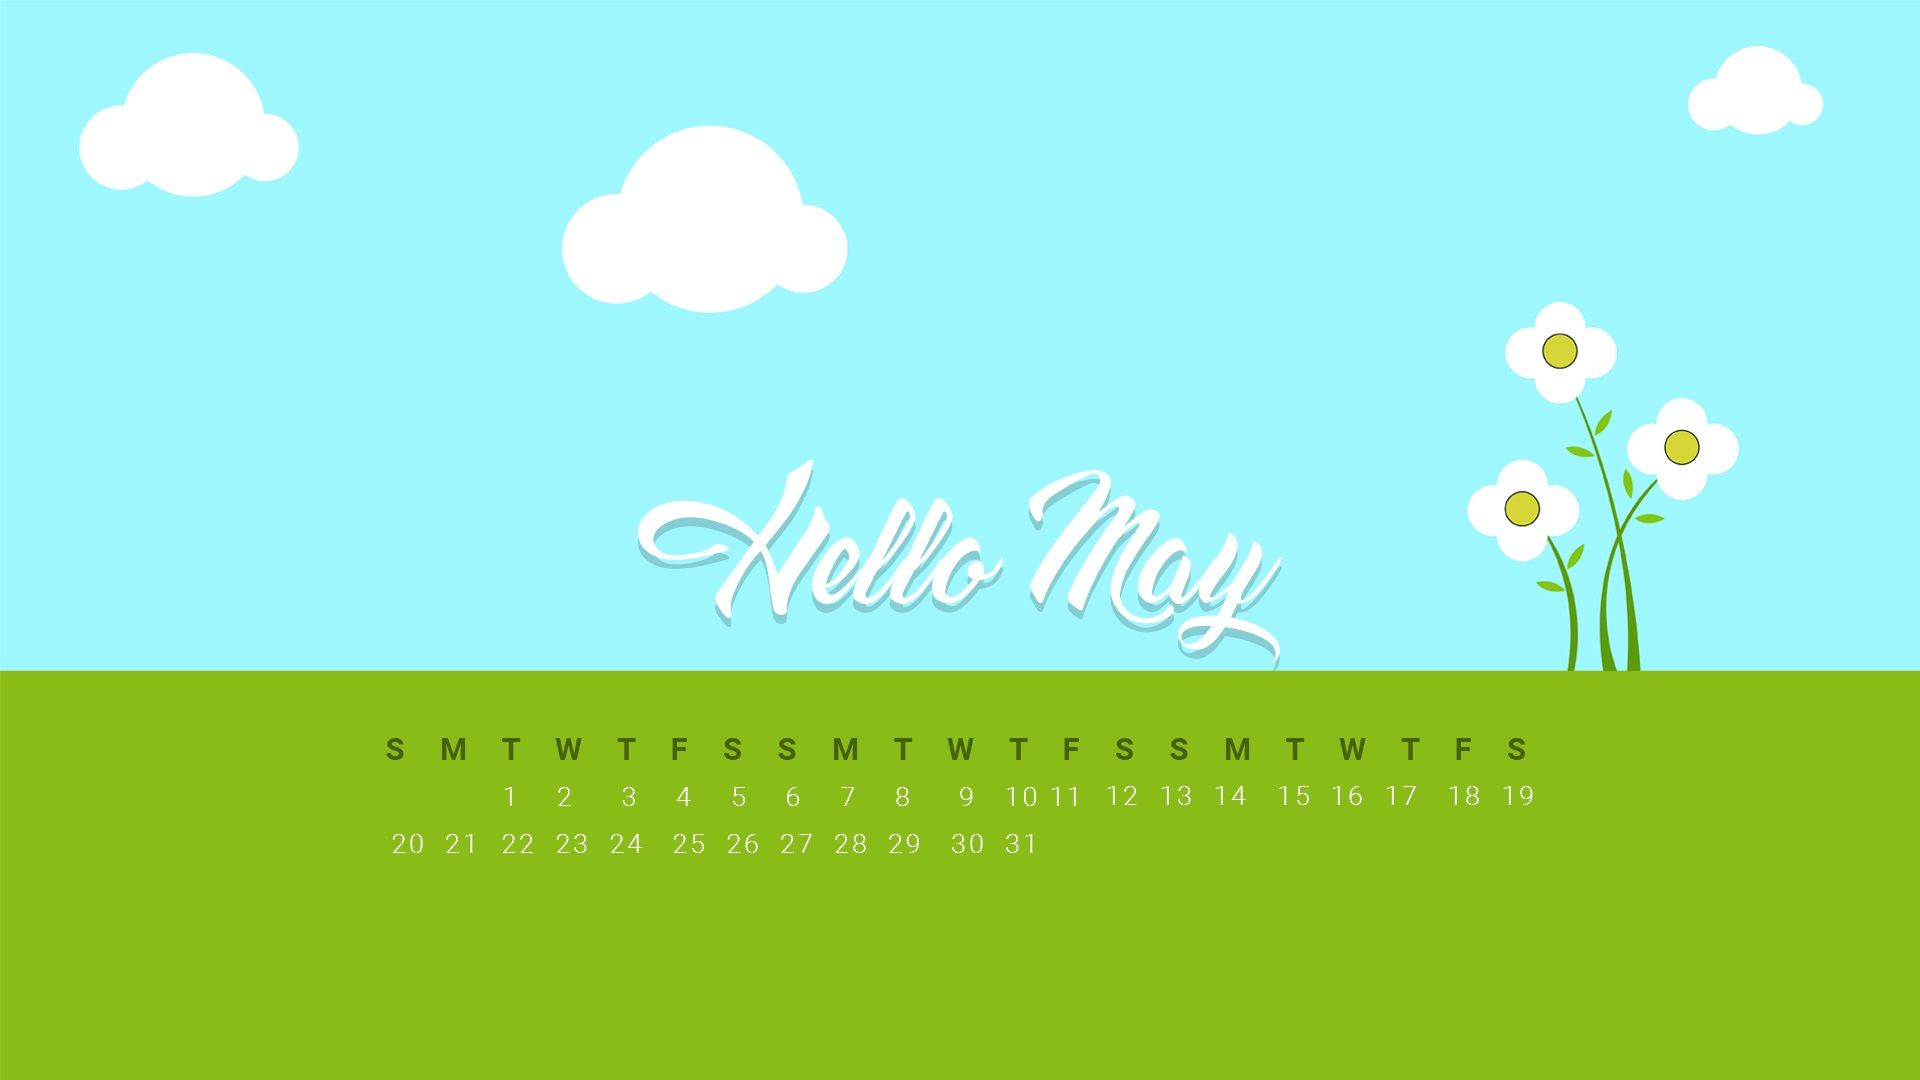 Hello May Month 2018 Calendar Wallpaper